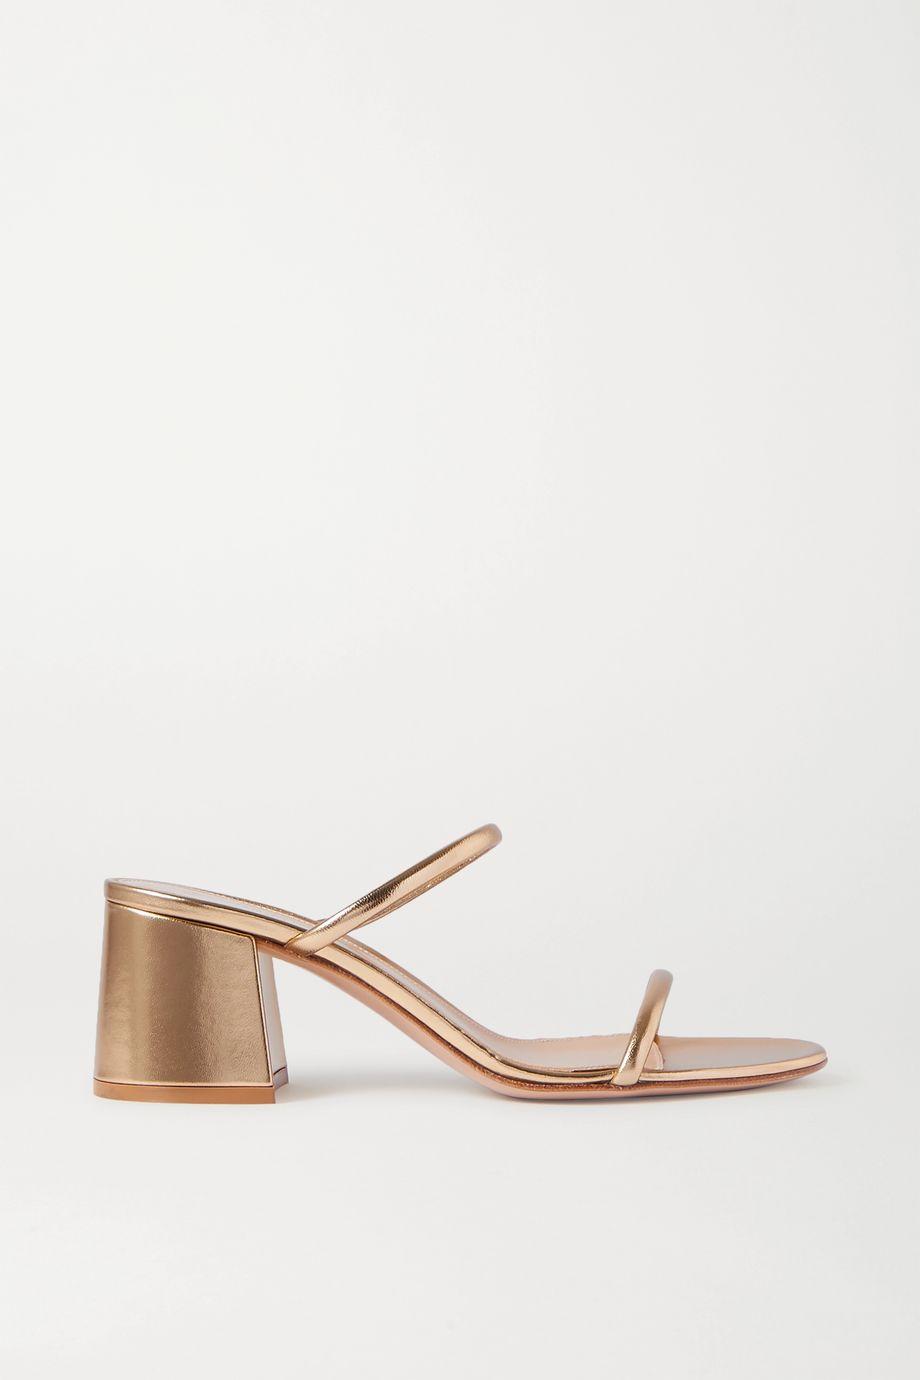 Gianvito Rossi 60 metallic leather sandals